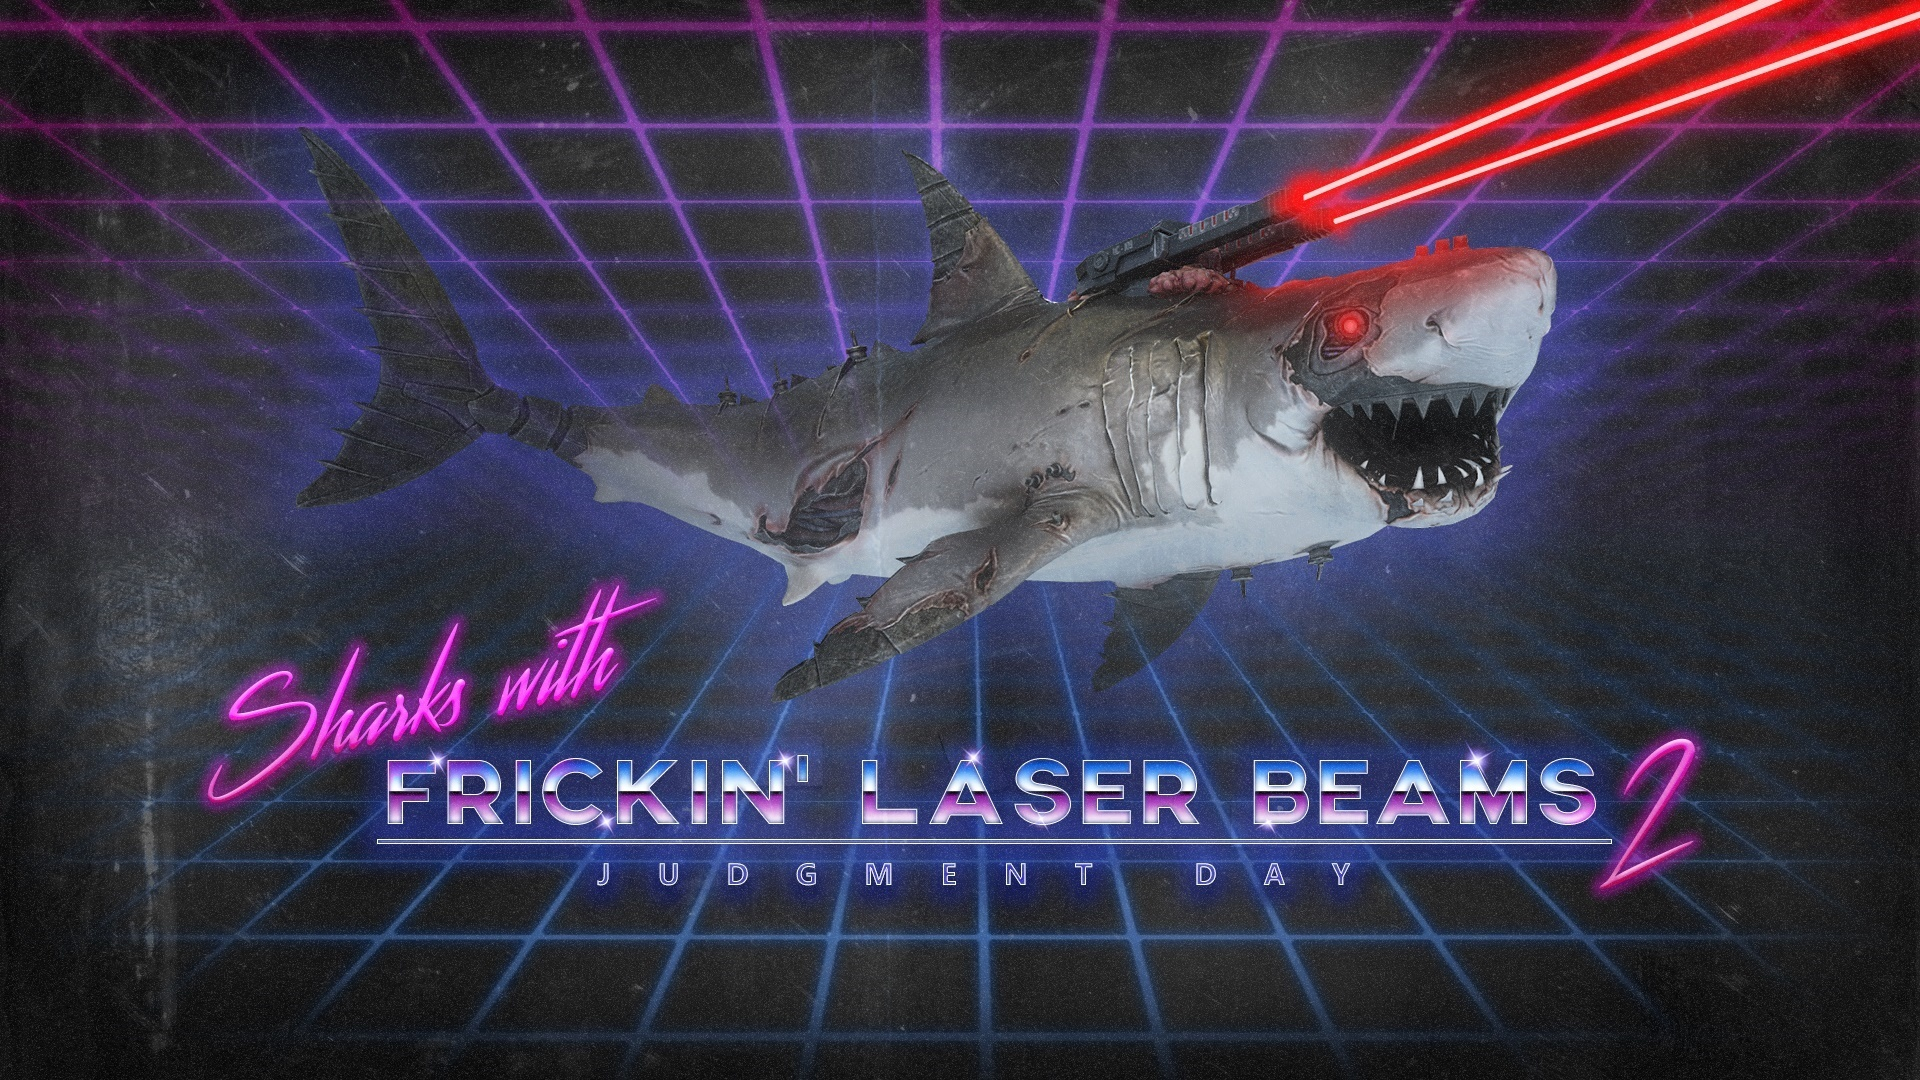 depth sharks with frickin